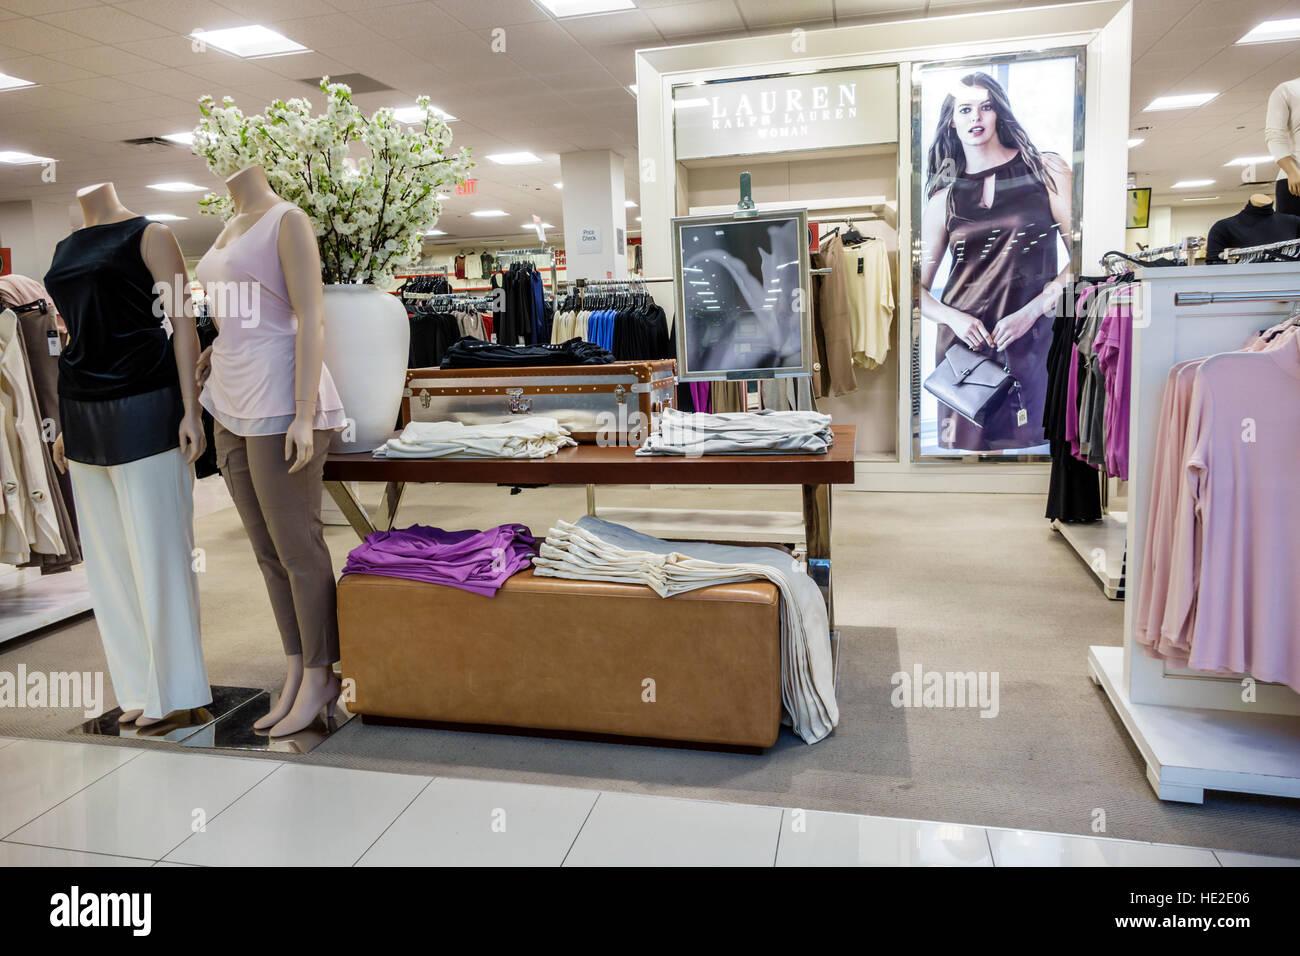 Miami Florida Aventura Mall Macy s Department Store im Inneren display  Verkauf Frauen Kleidung Ralph Lauren Stockbild fbf8cce126